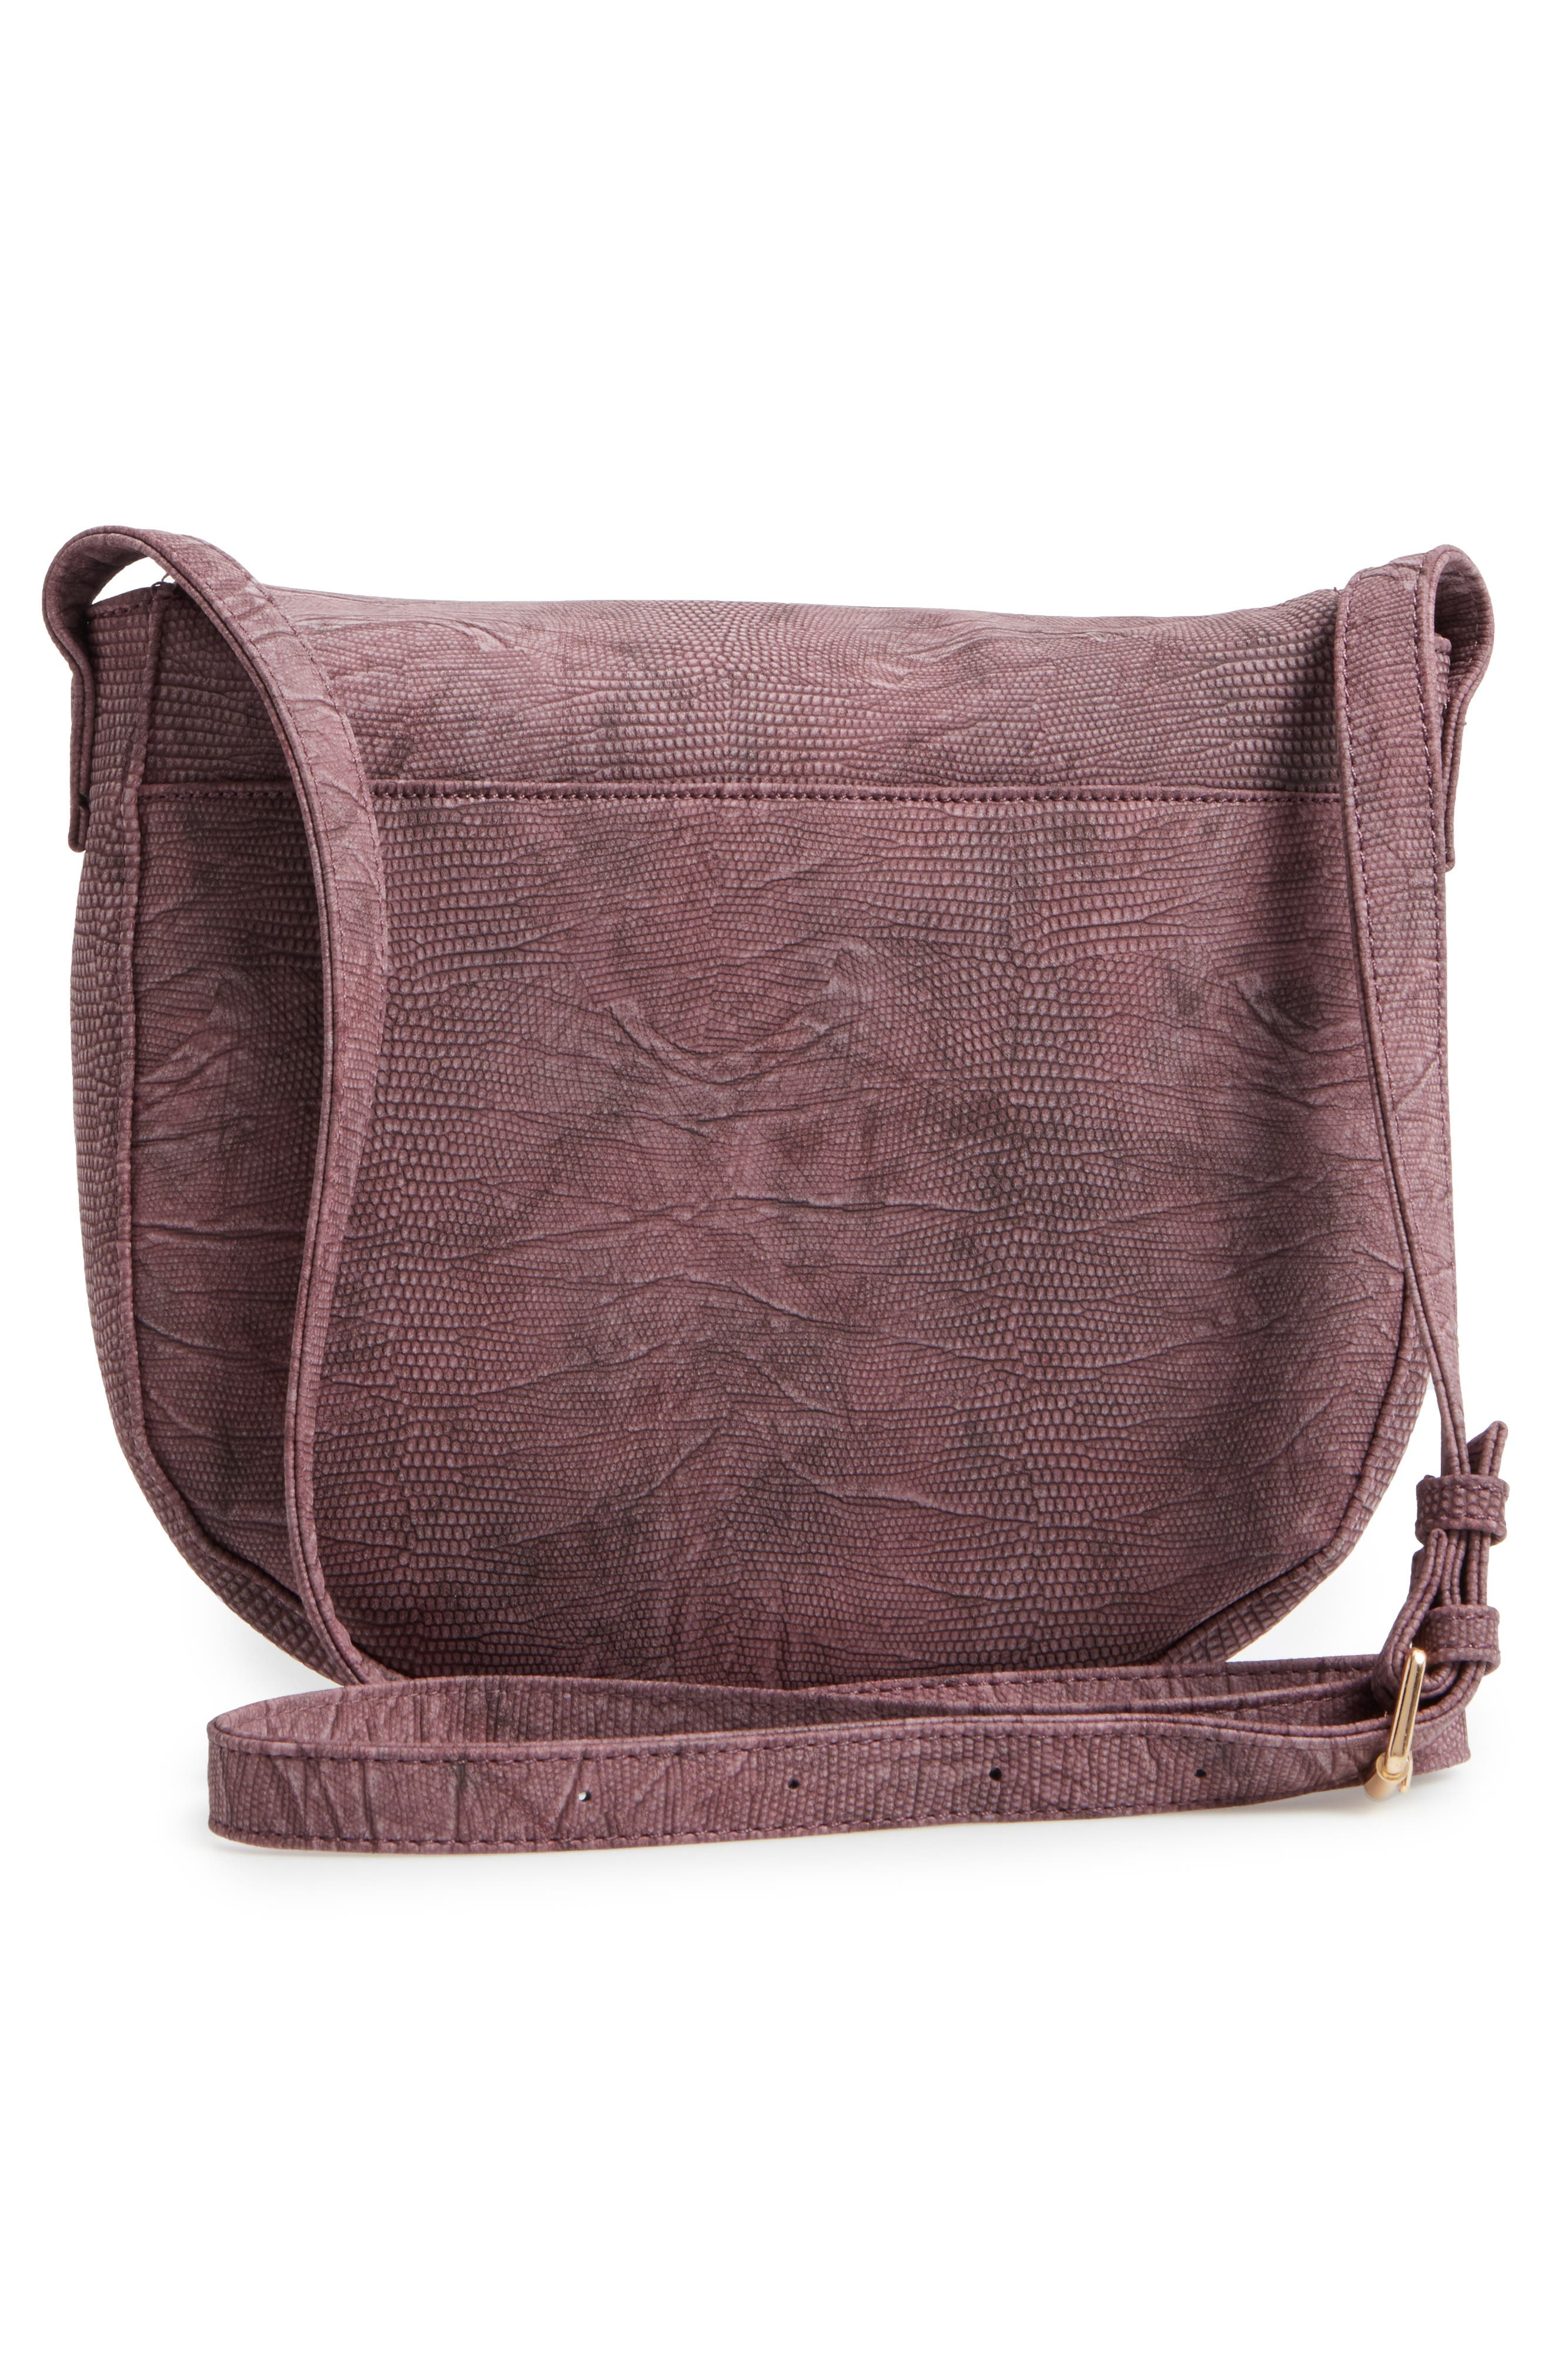 Livvy Faux Leather Crossbody Saddle Bag,                             Alternate thumbnail 9, color,